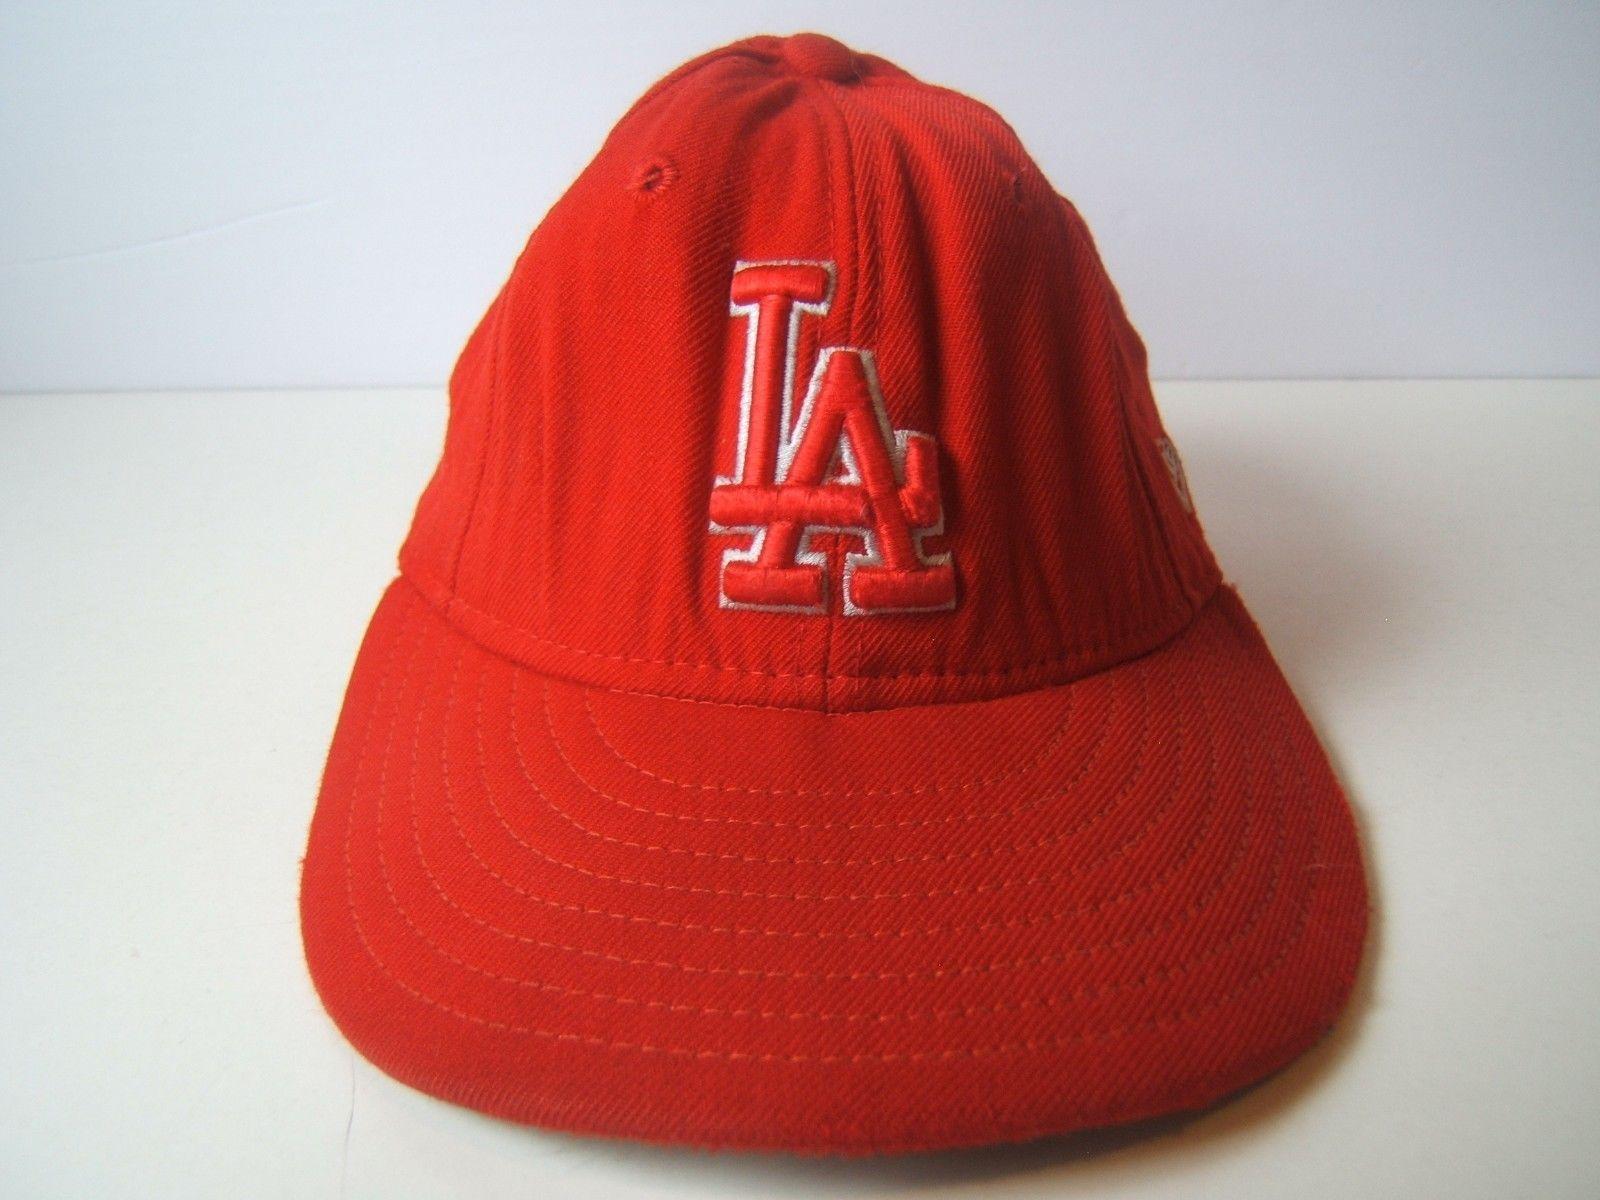 Los Angeles Dodgers LA Hat Red 6 7/8 54.9cm Fitted New Era MLB Baseball Cap